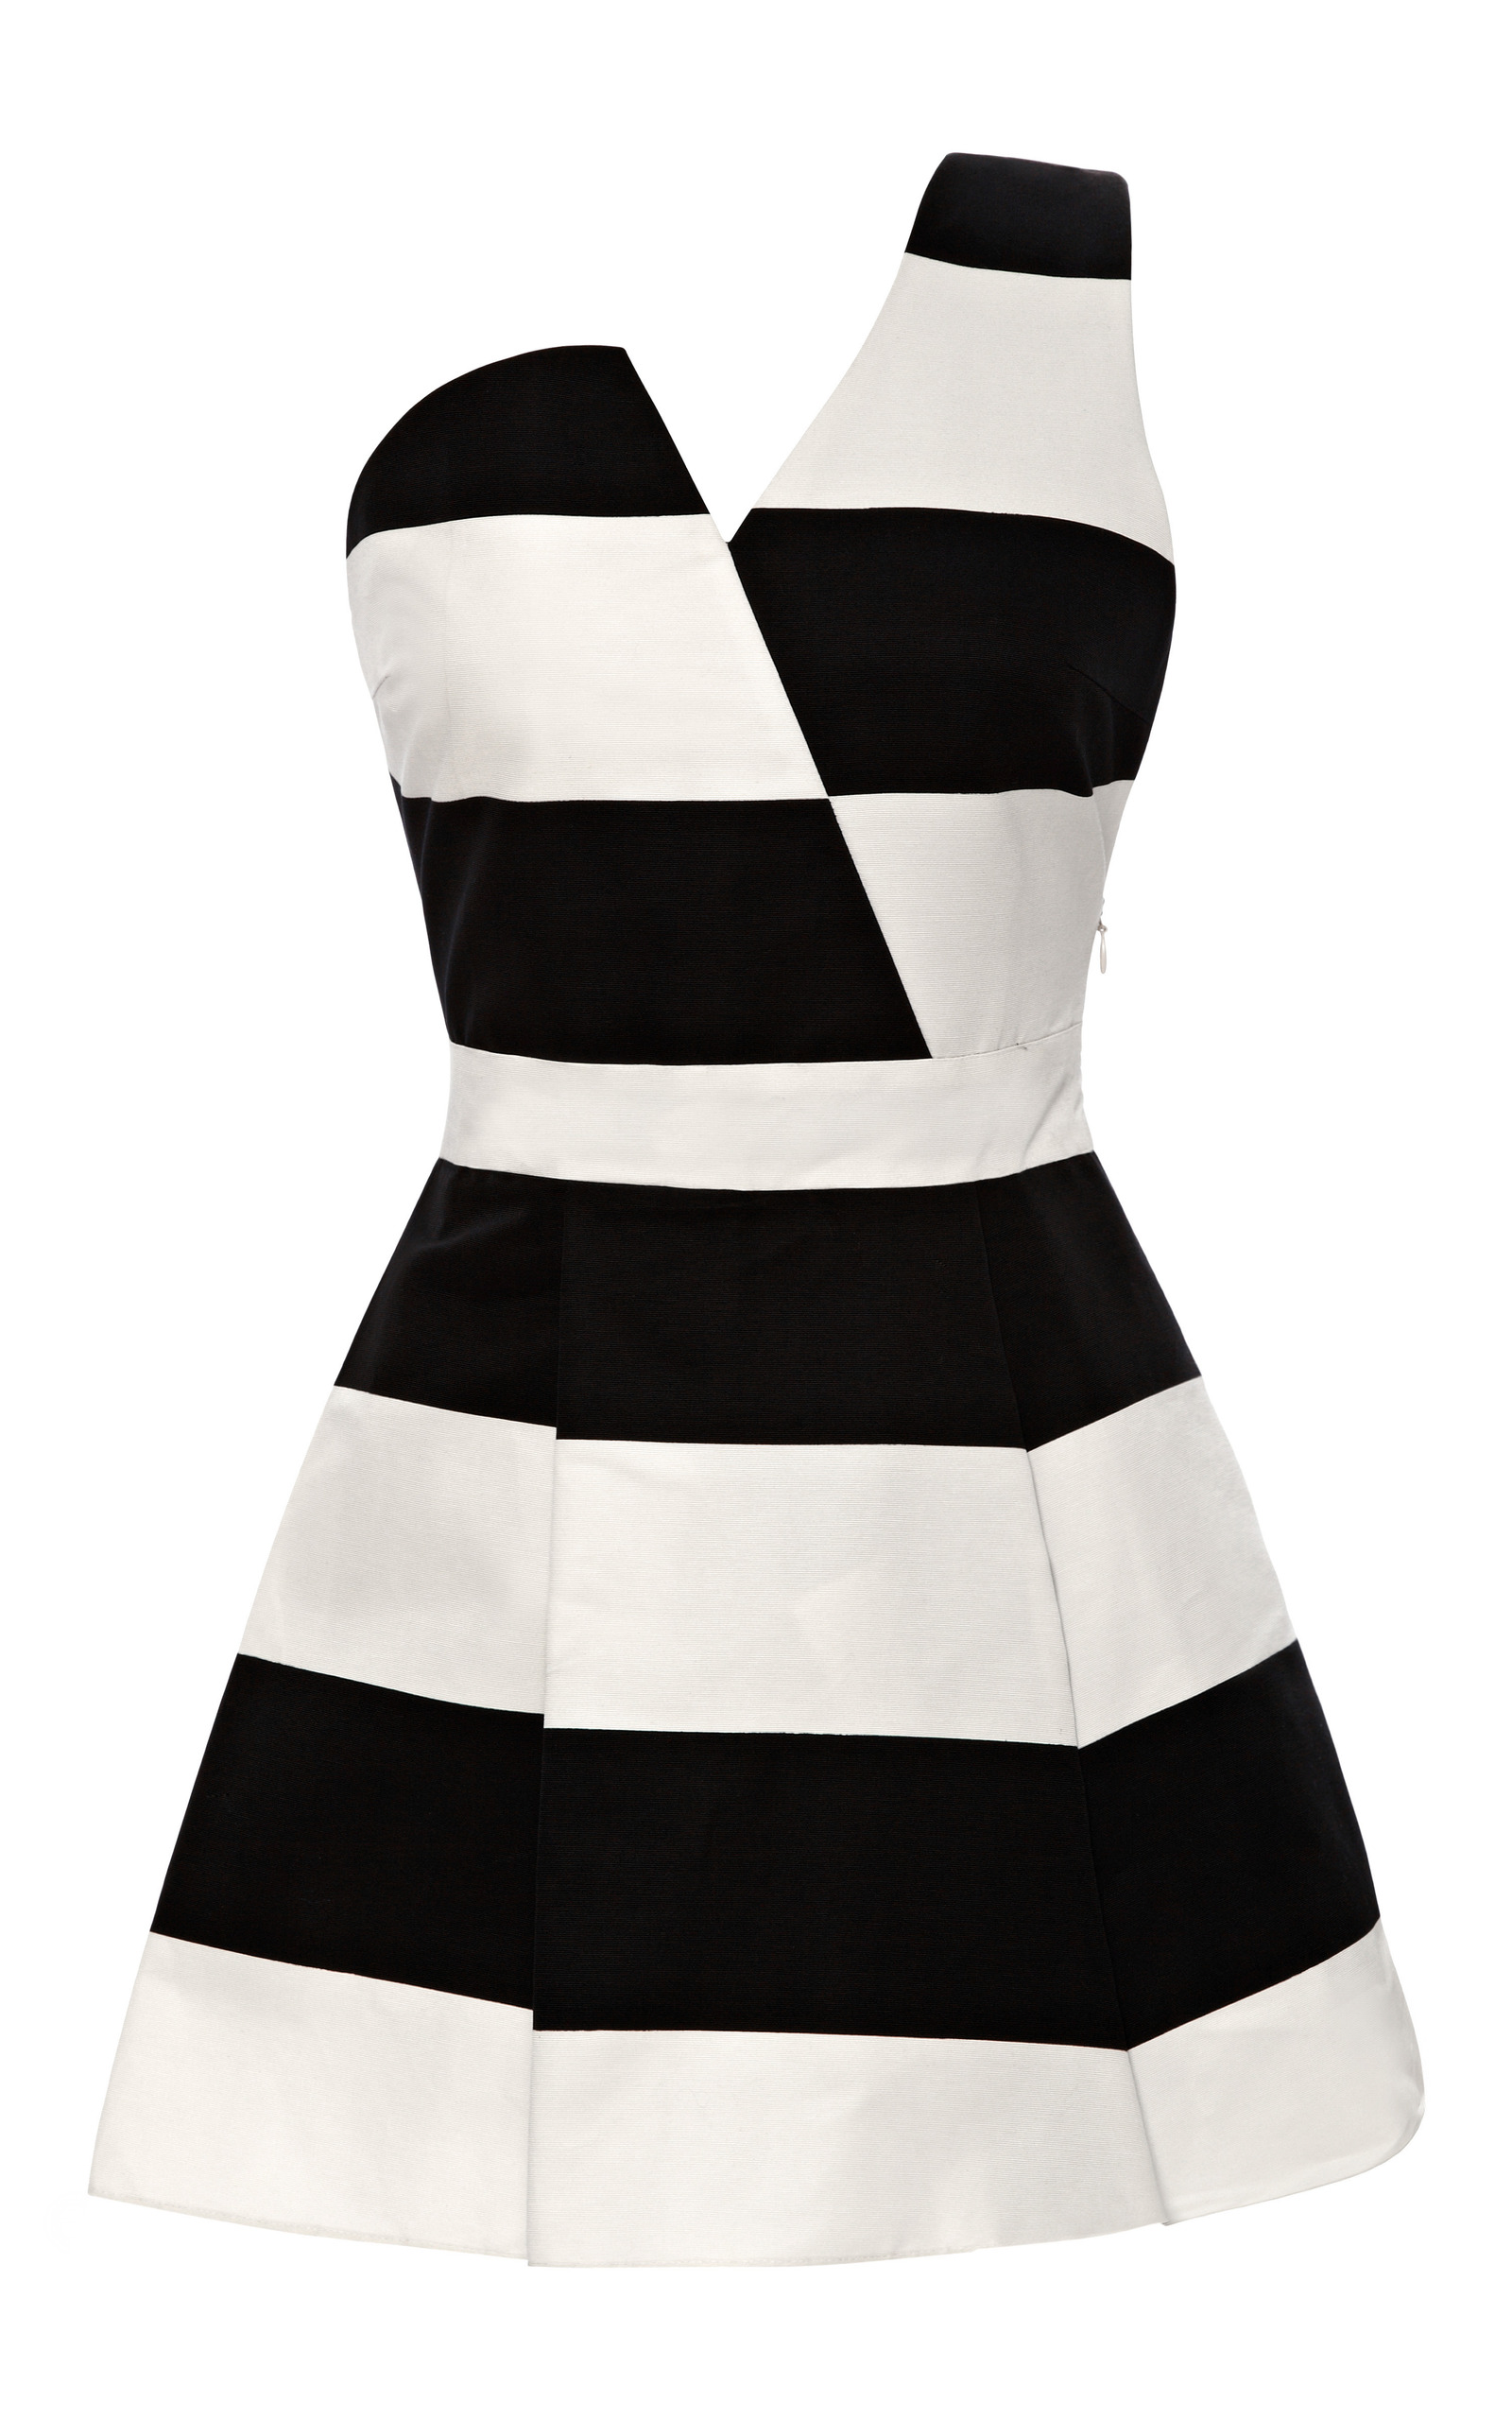 4f925faa16a1 Asymmetric Black And White Striped Dress by Kalmanovich | Moda Operandi